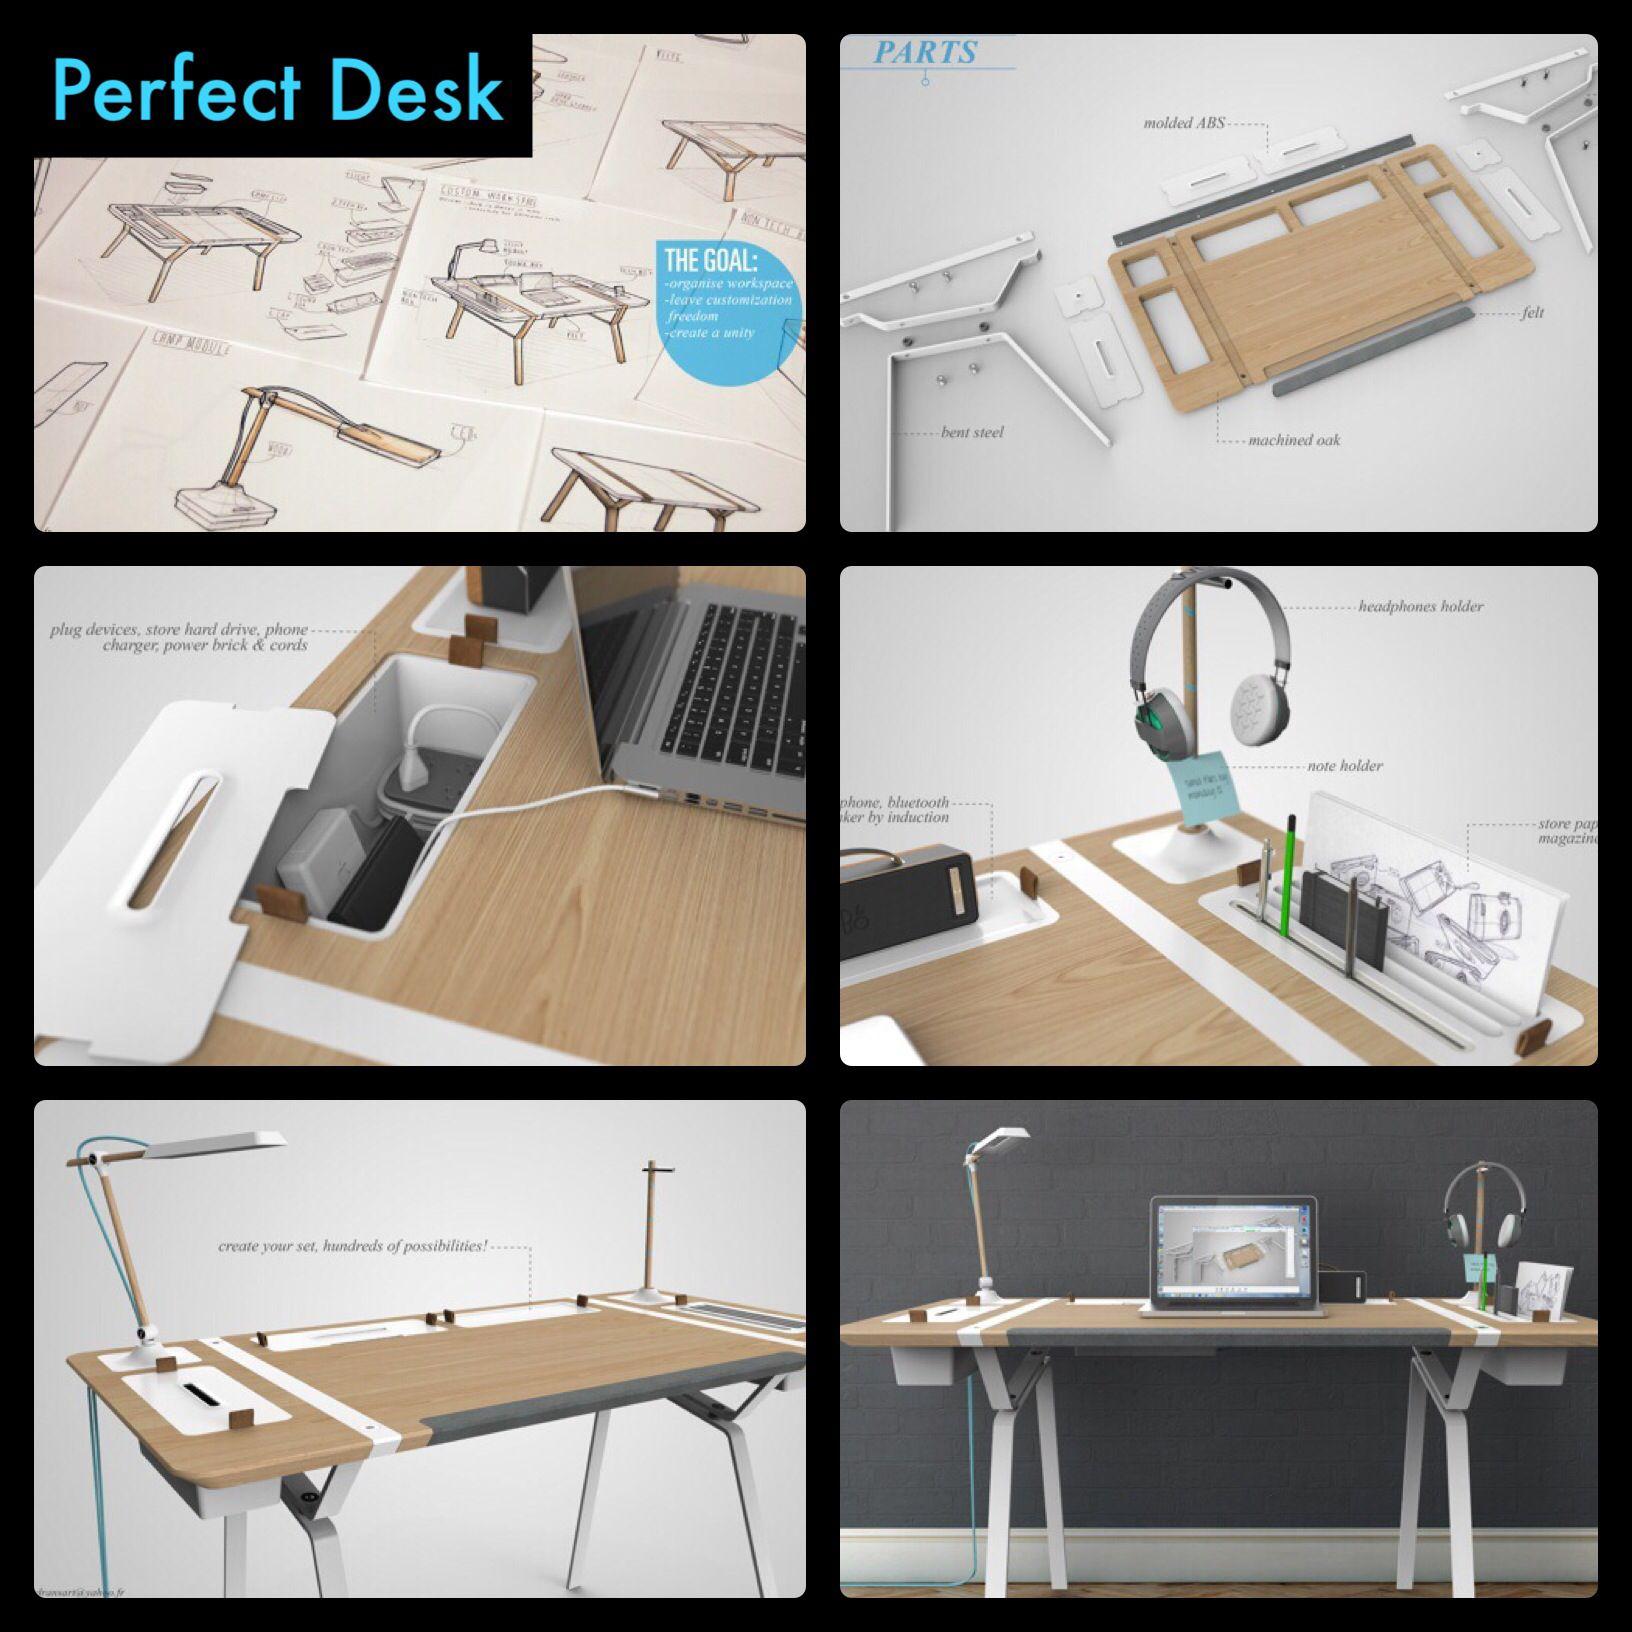 Modular Desk, Perfect Desk, Desk